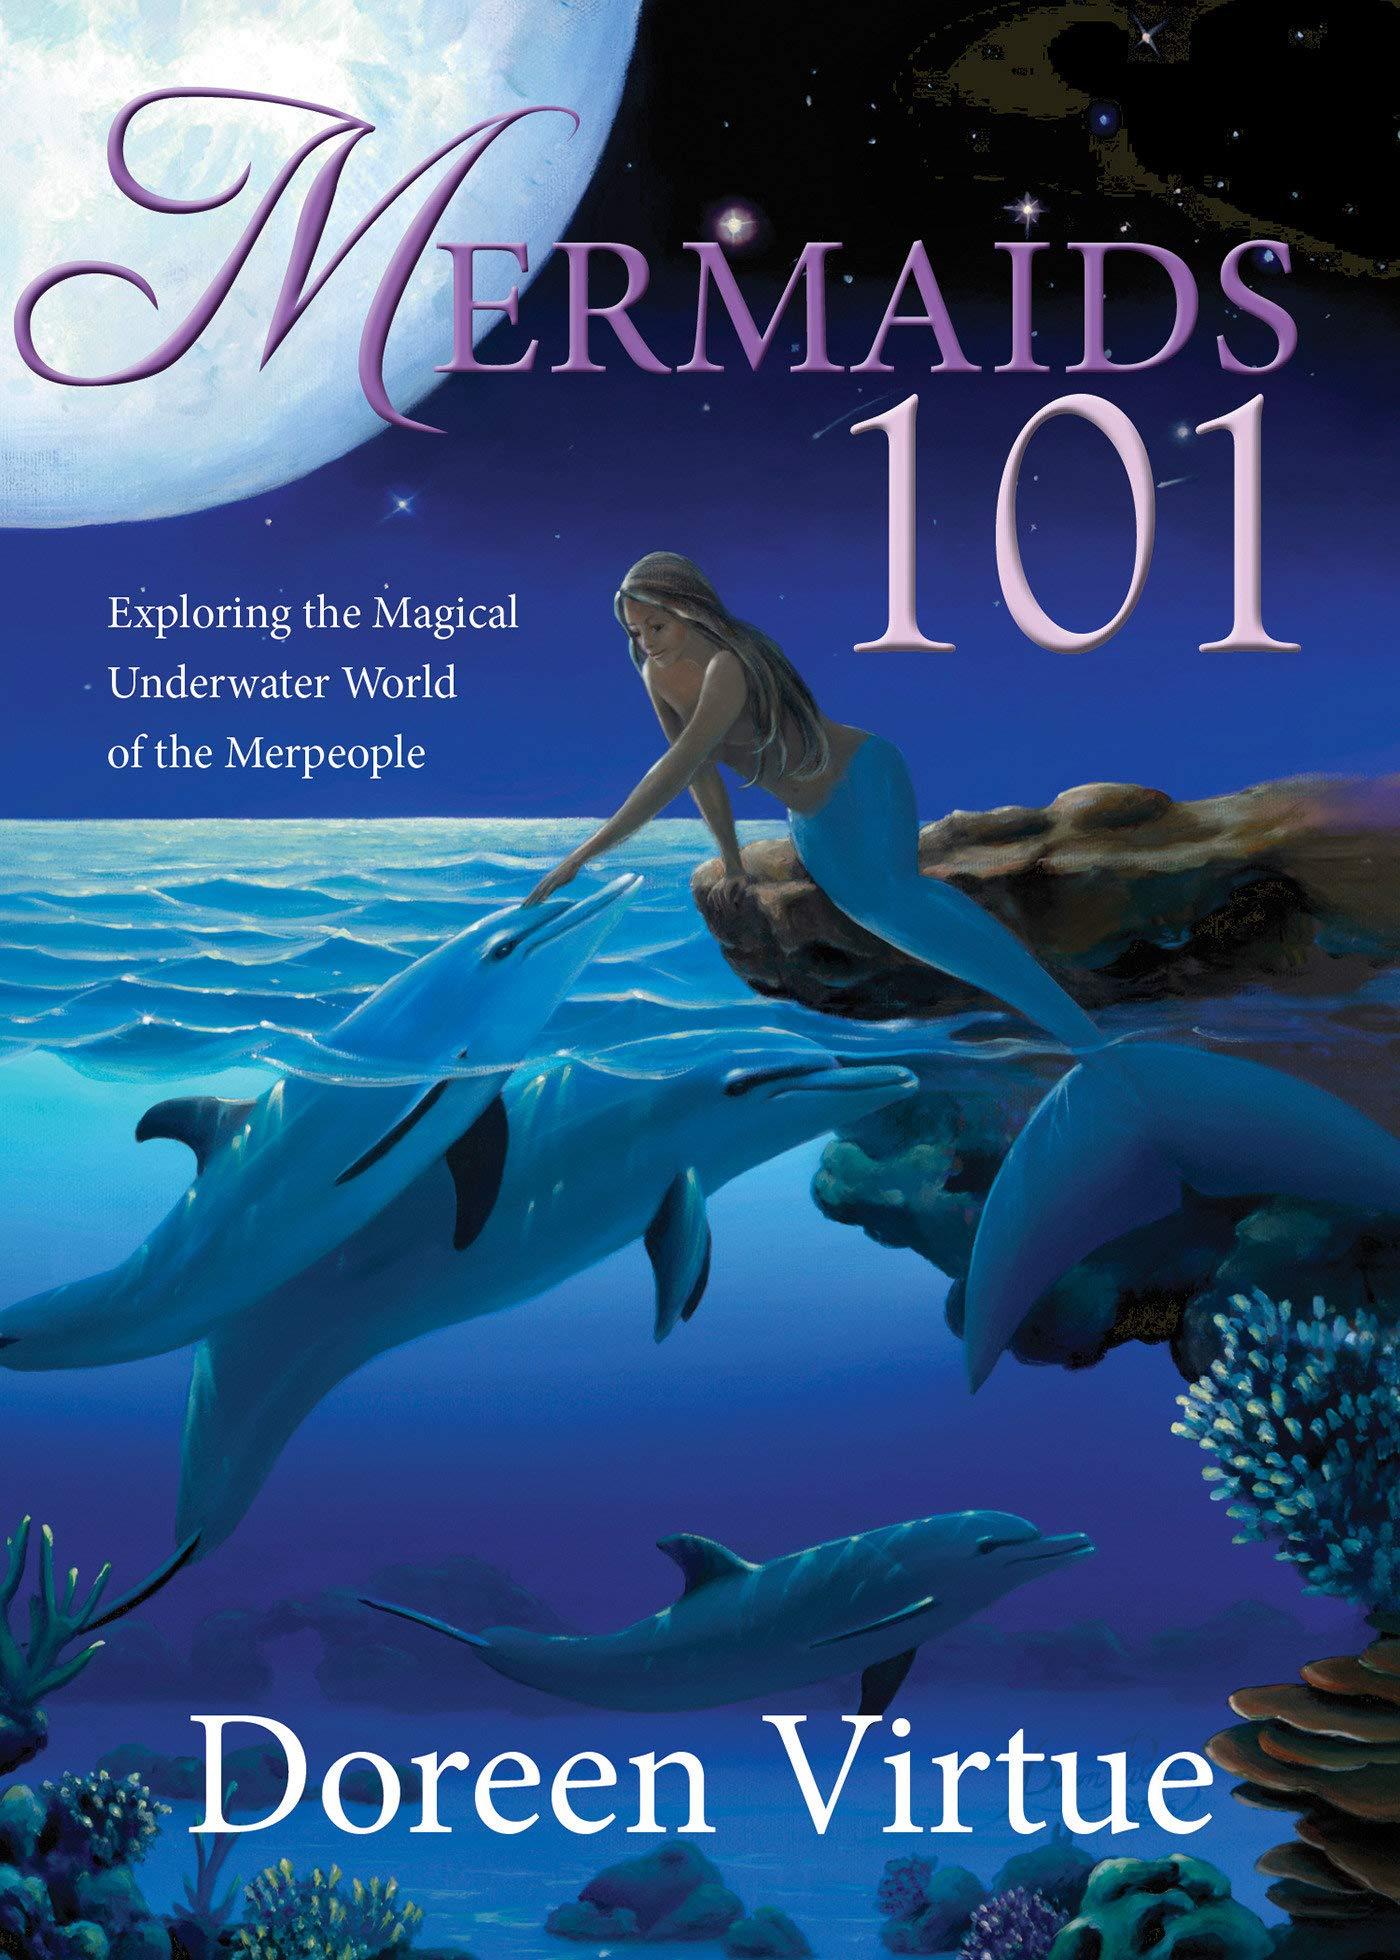 Download Mermaids 101: Exploring the Magical Underwater World of the Merpeople PDF